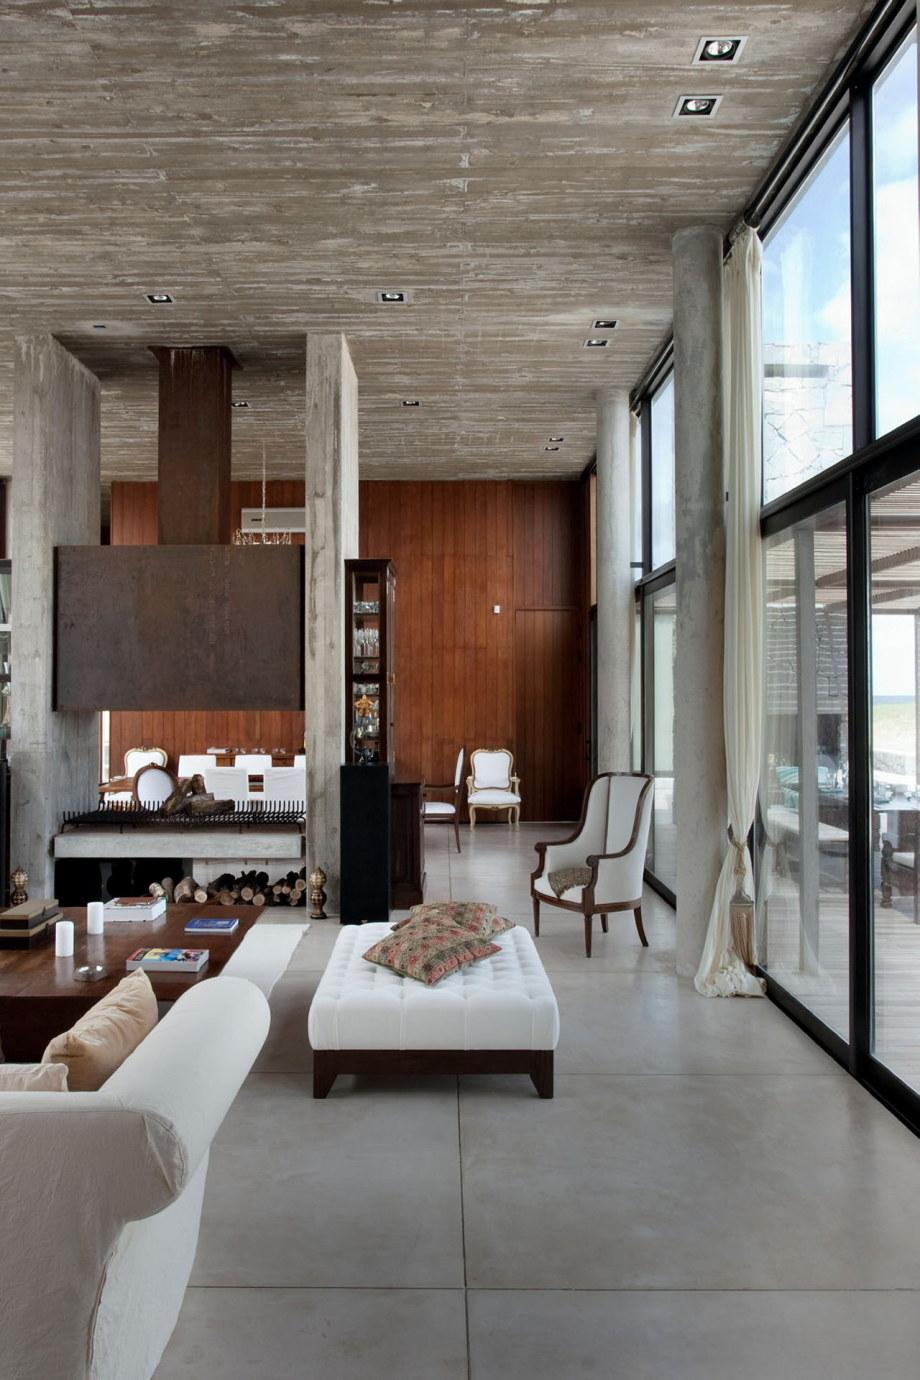 The beach house La Boyita Residence by Martin Gomez Arguitectos, Uruguay 22